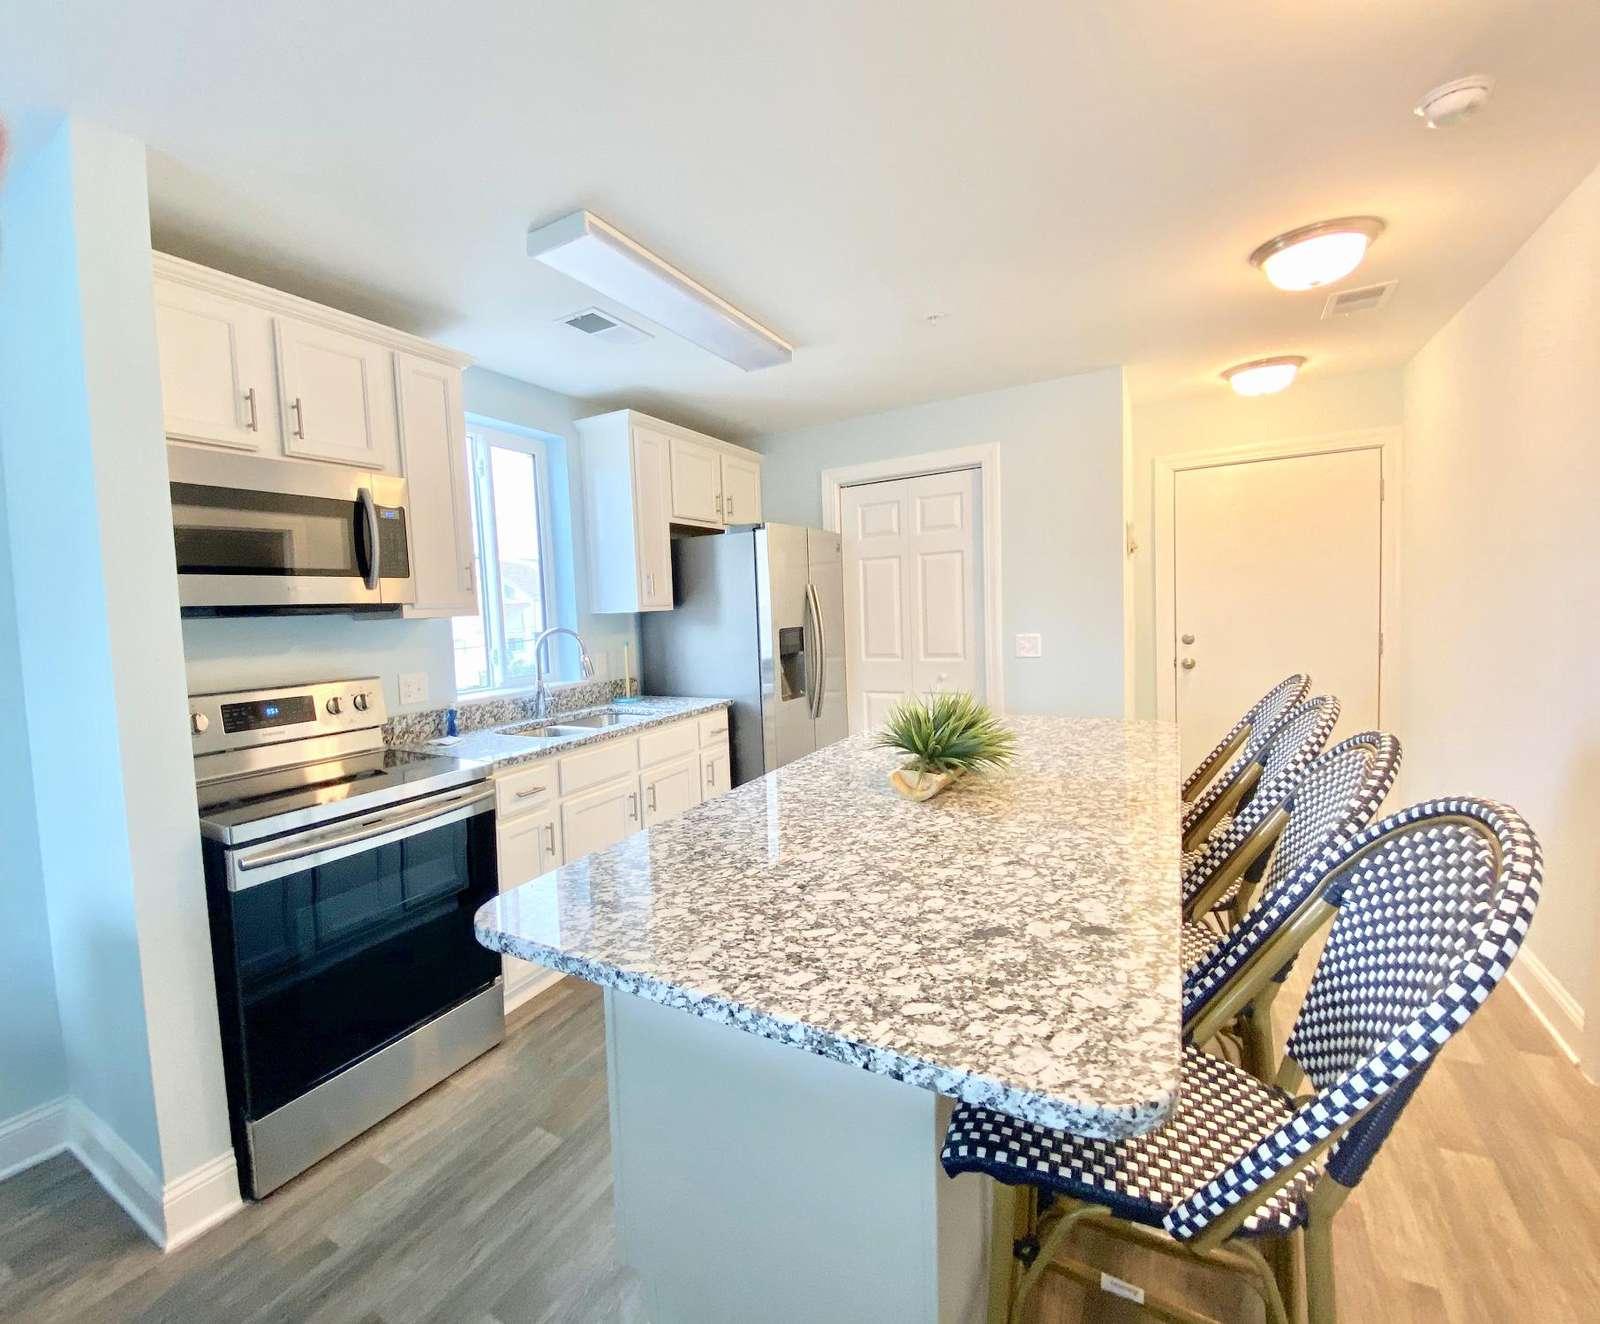 Open floor plan with an abundance of natural light throughout